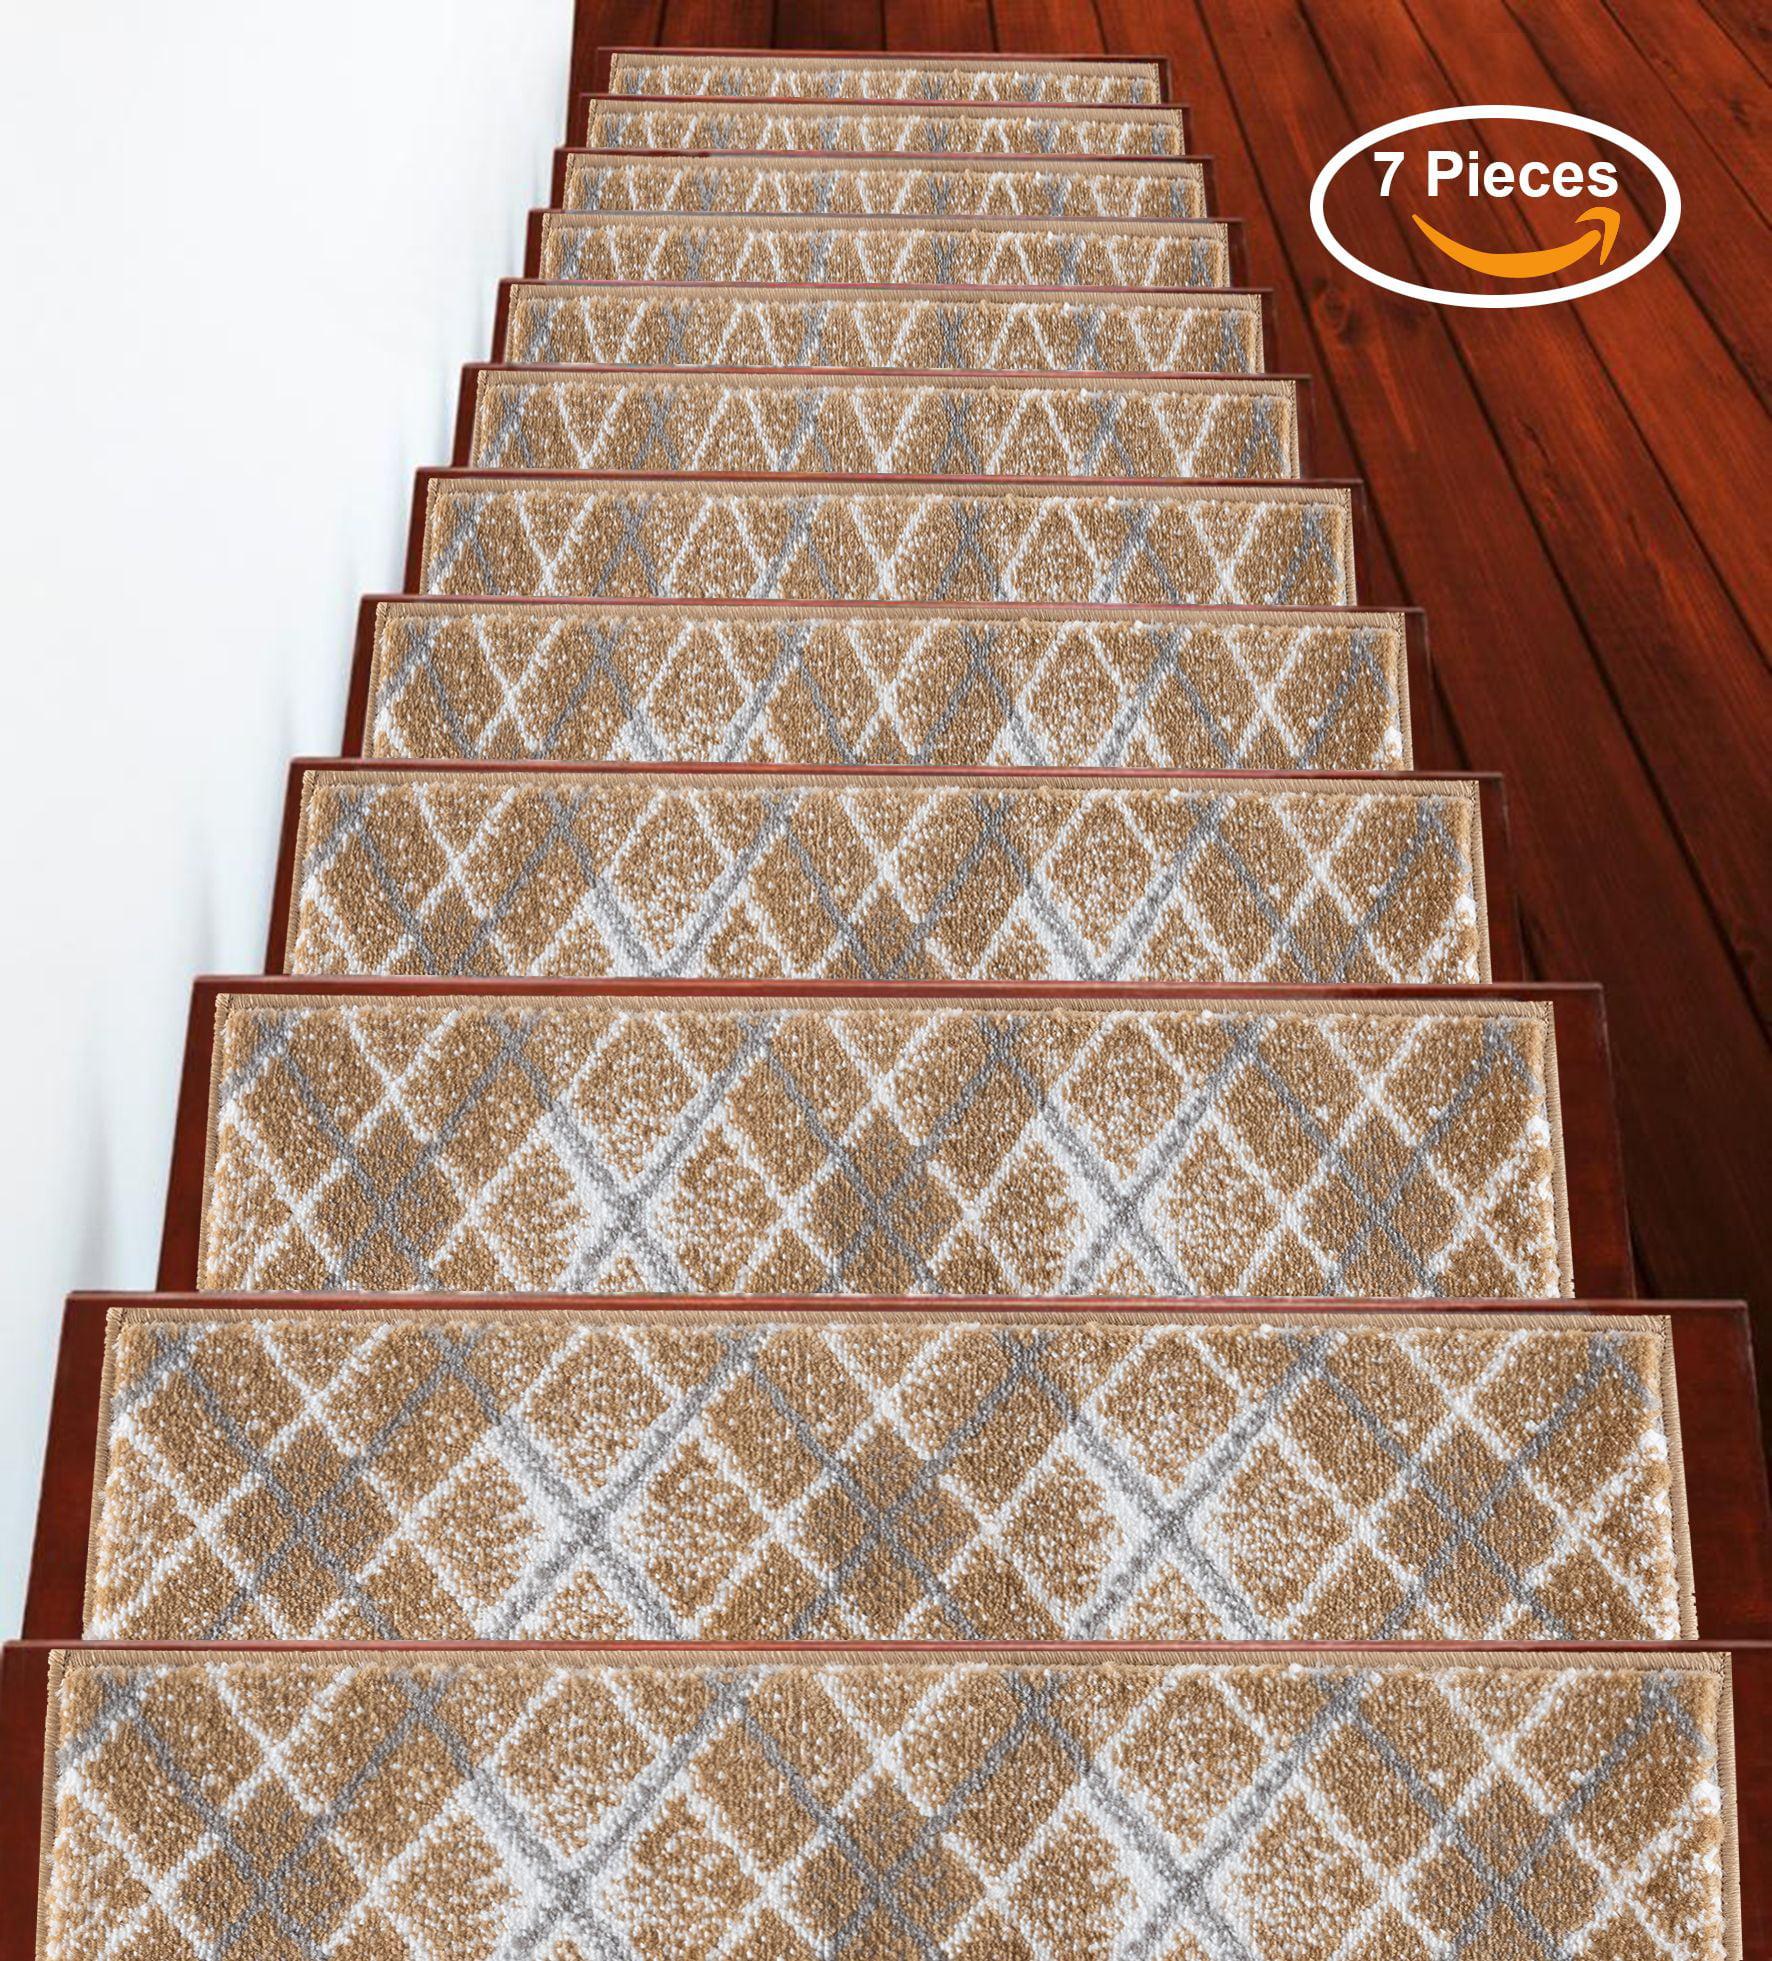 Stairs Treads Anti Slip Stair Treads Non Slip Stair Treads Stair Grips Indoor Outdoor Stair Treads Carpet Stair Treads Stair Runner Carpet Runner For Stairs Beige White 9 X 28 7 Set